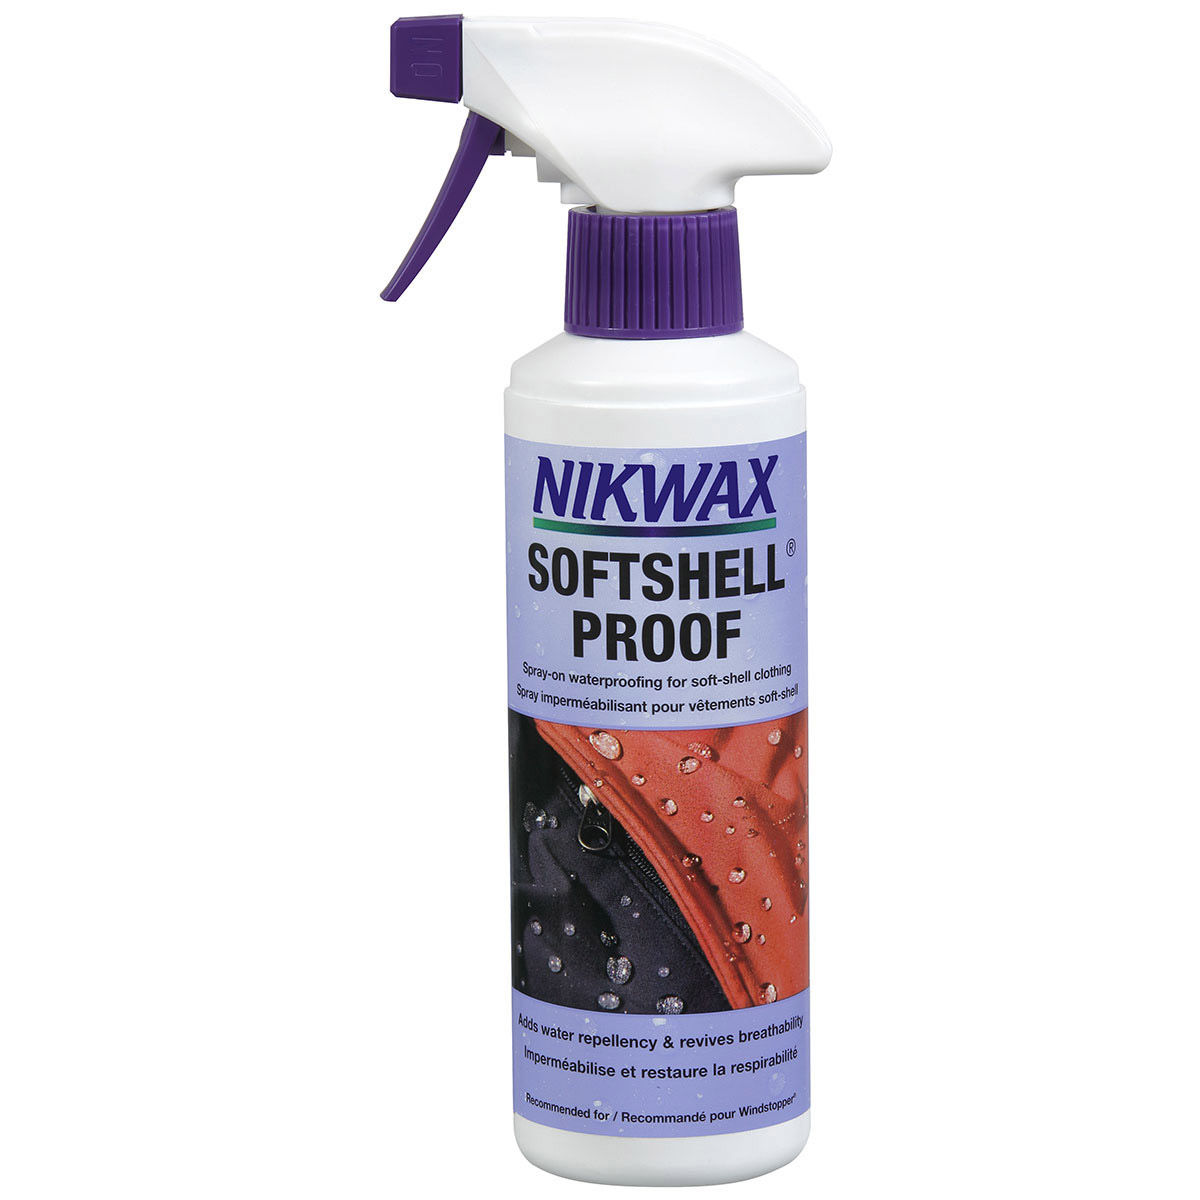 Nikwax SoftShell Proof Spray-On